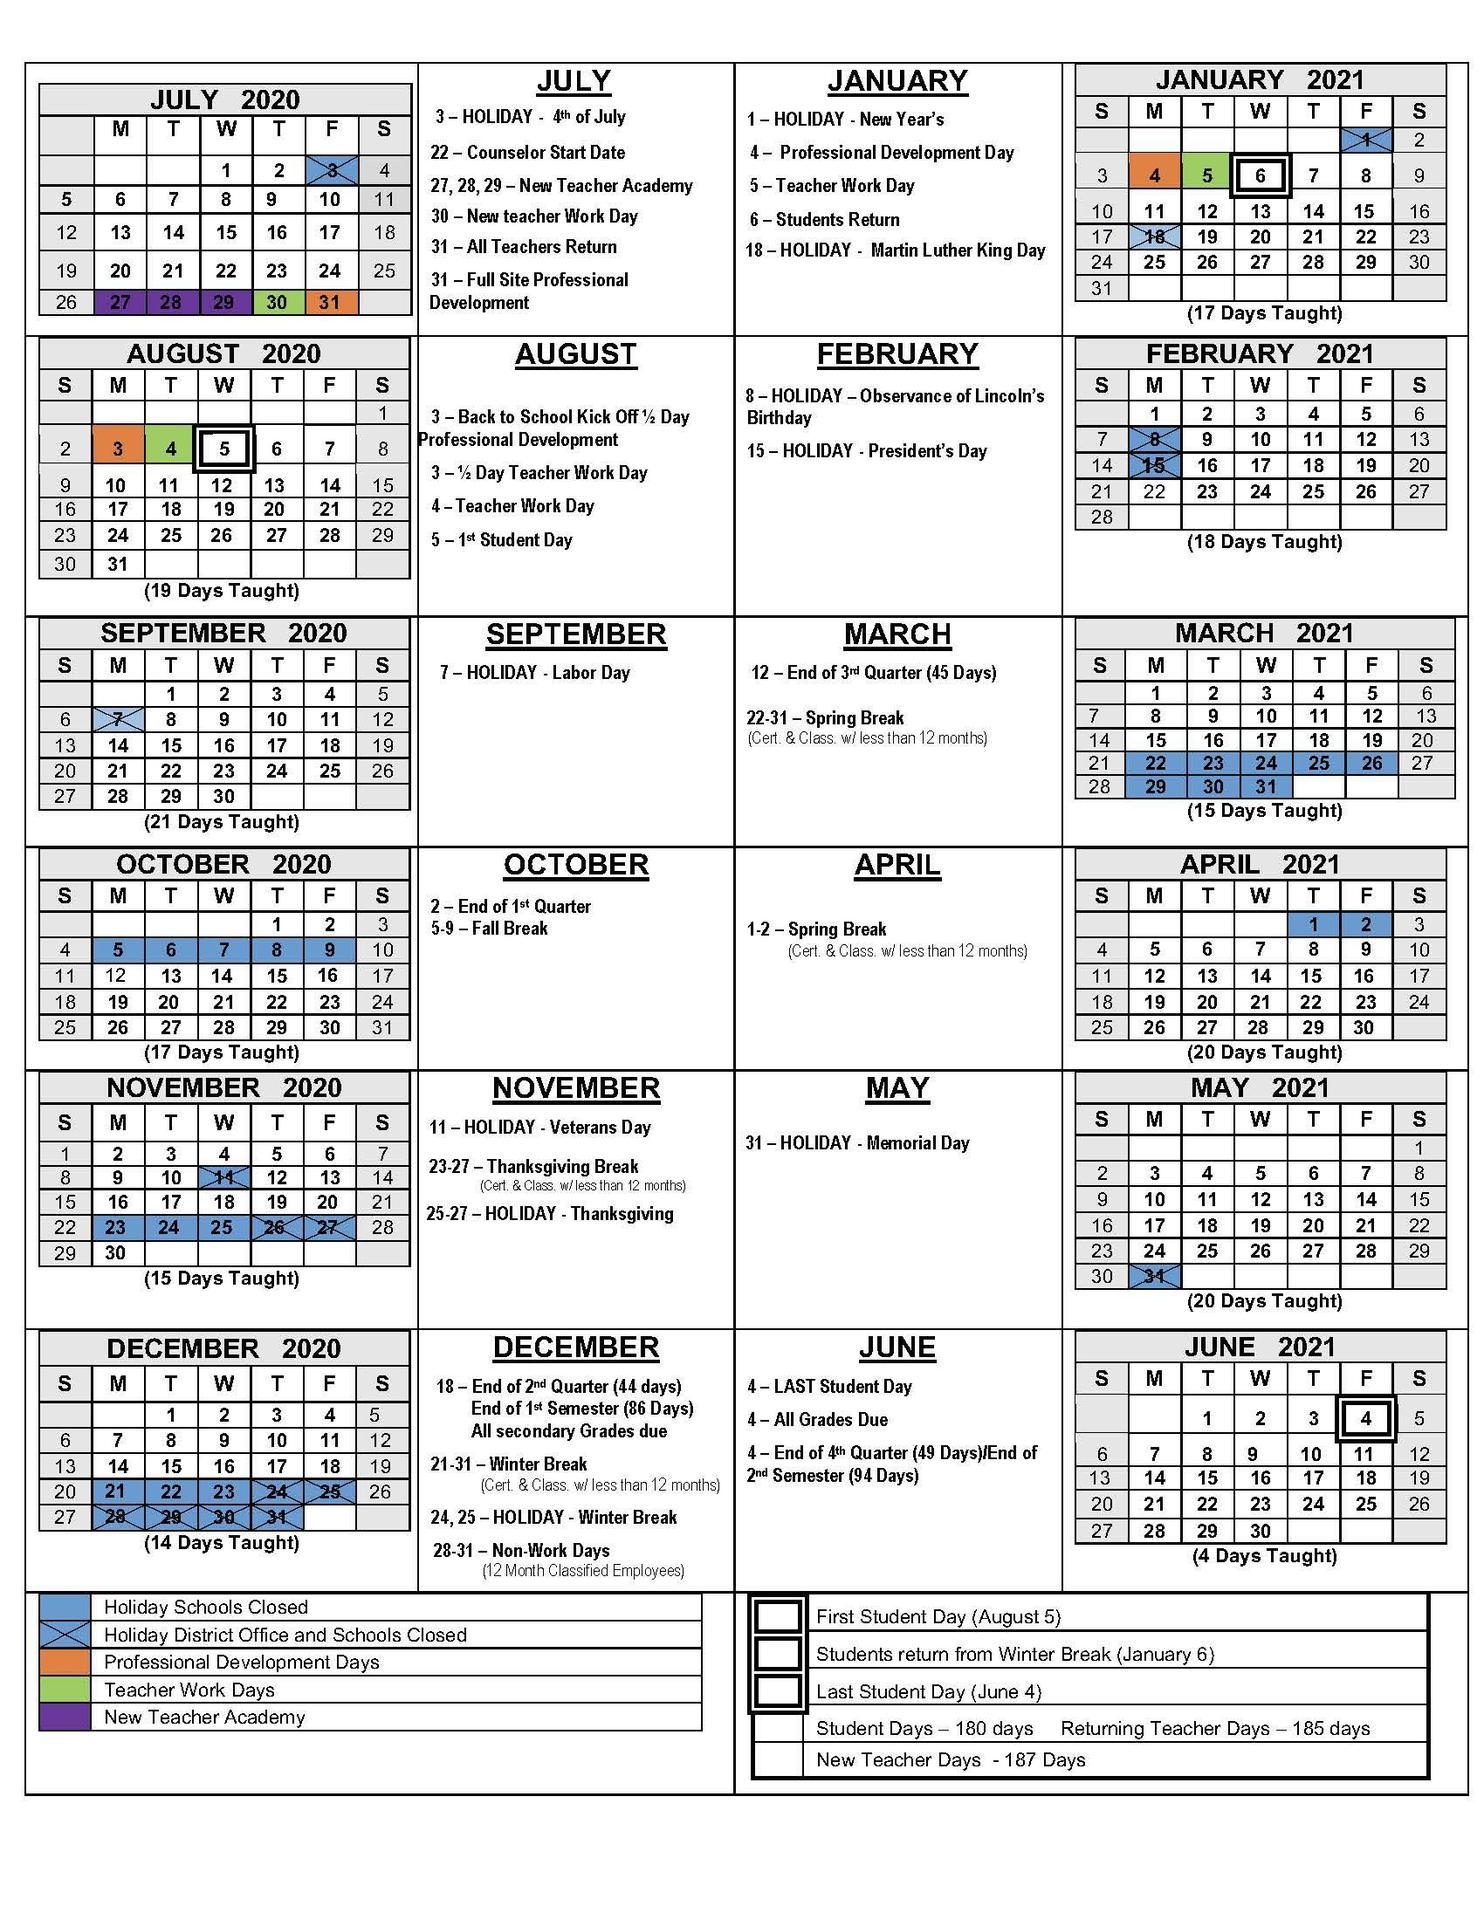 Uc Santa Cruz Academic Calendar 2021-22 2020 21 School Calendars – Academic Calendars – Monterey Peninsula